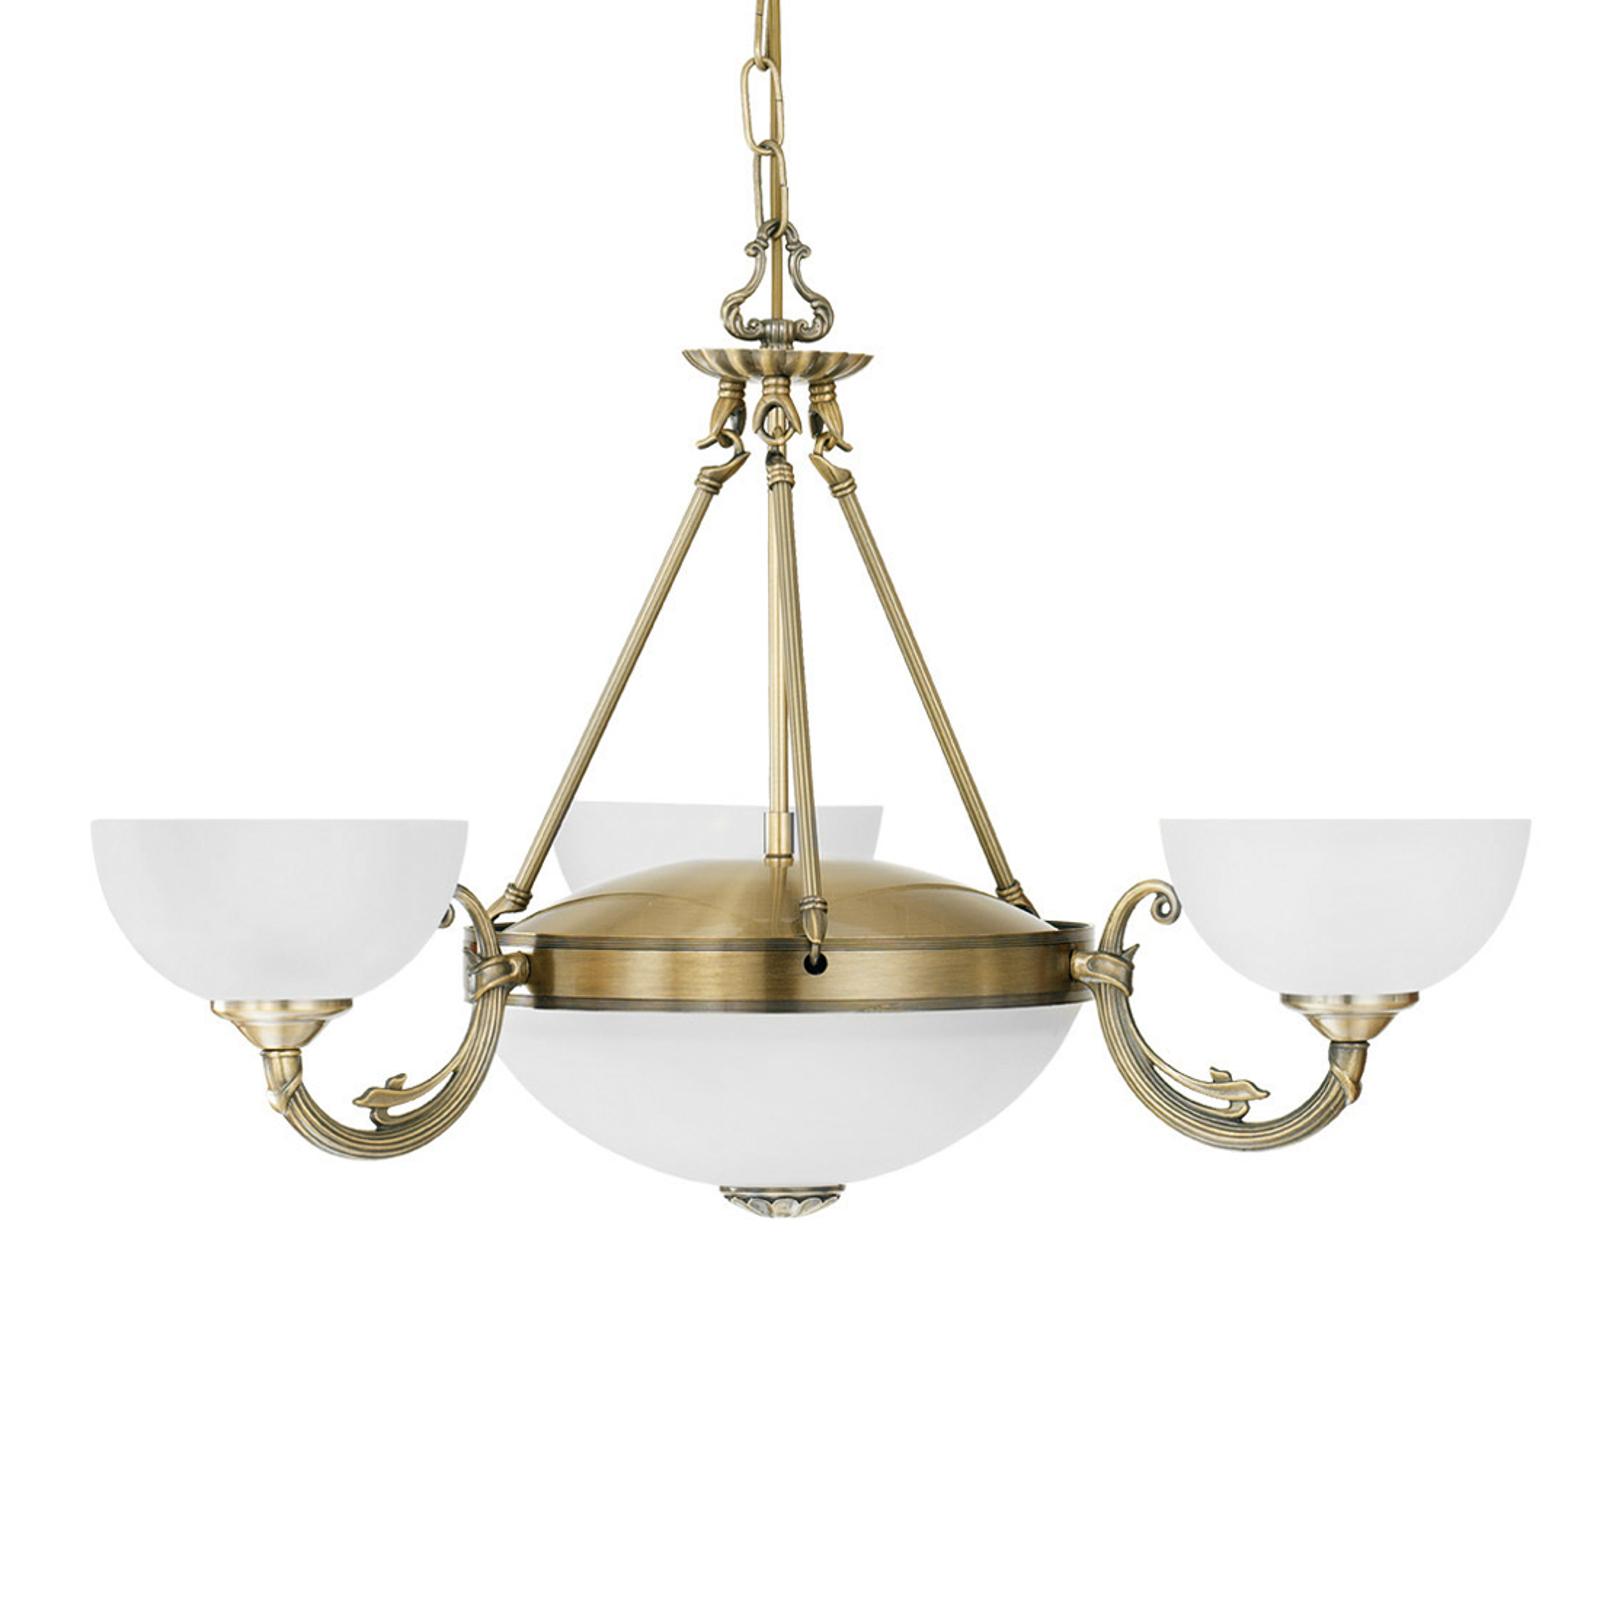 Suspension Savy à cinq lampes